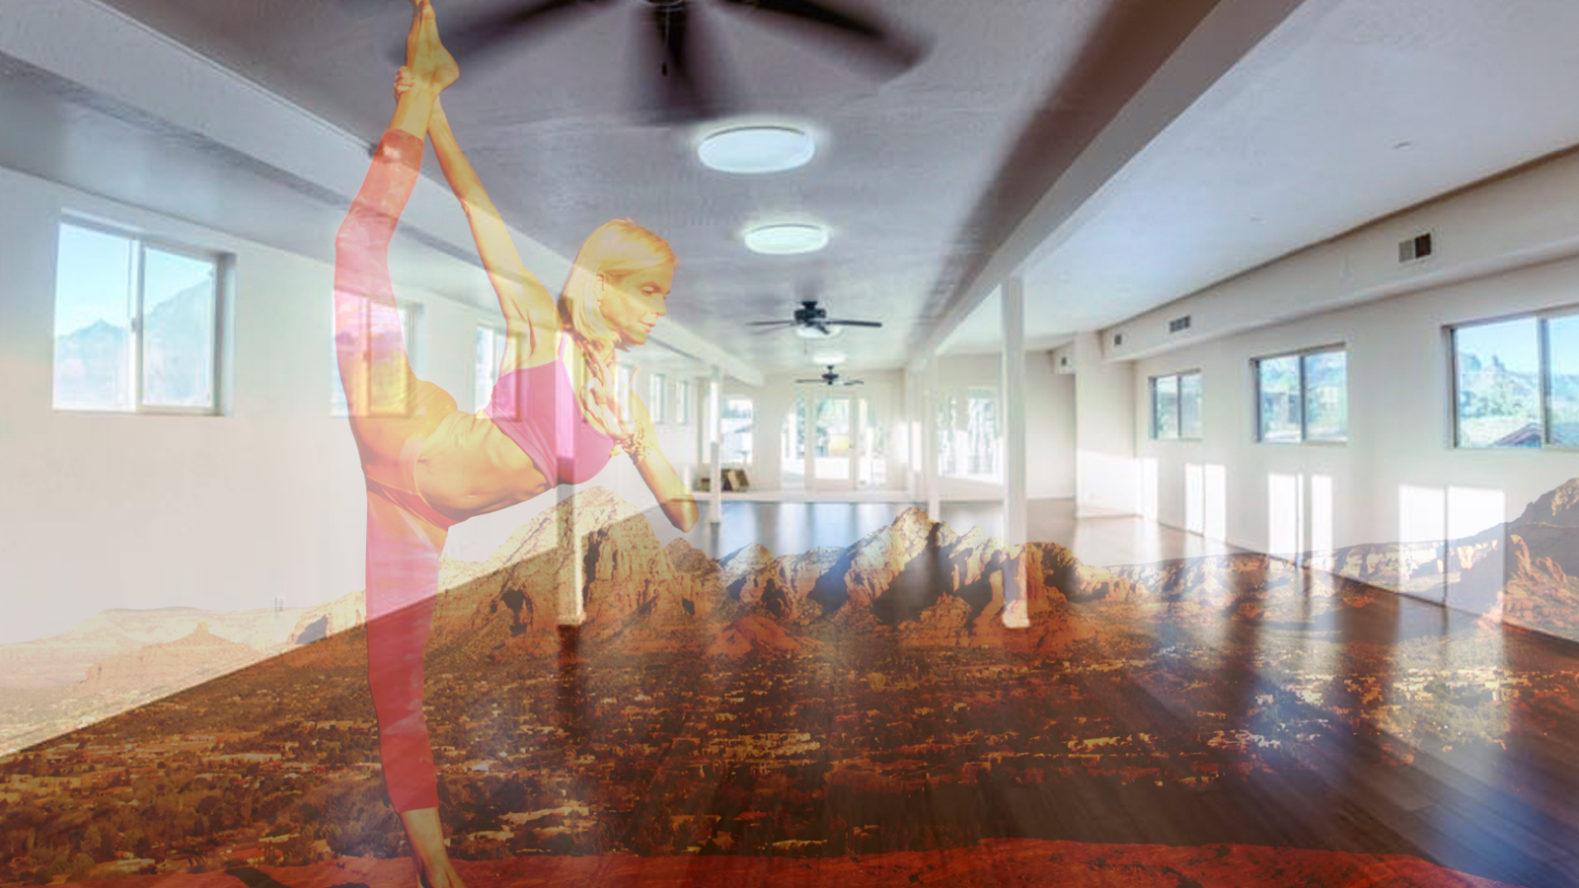 Tymi Howard & Steve Ross 200 Hour Yoga Teacher Training Certification • May 19th-28, 2017 • August 18-27, 2017